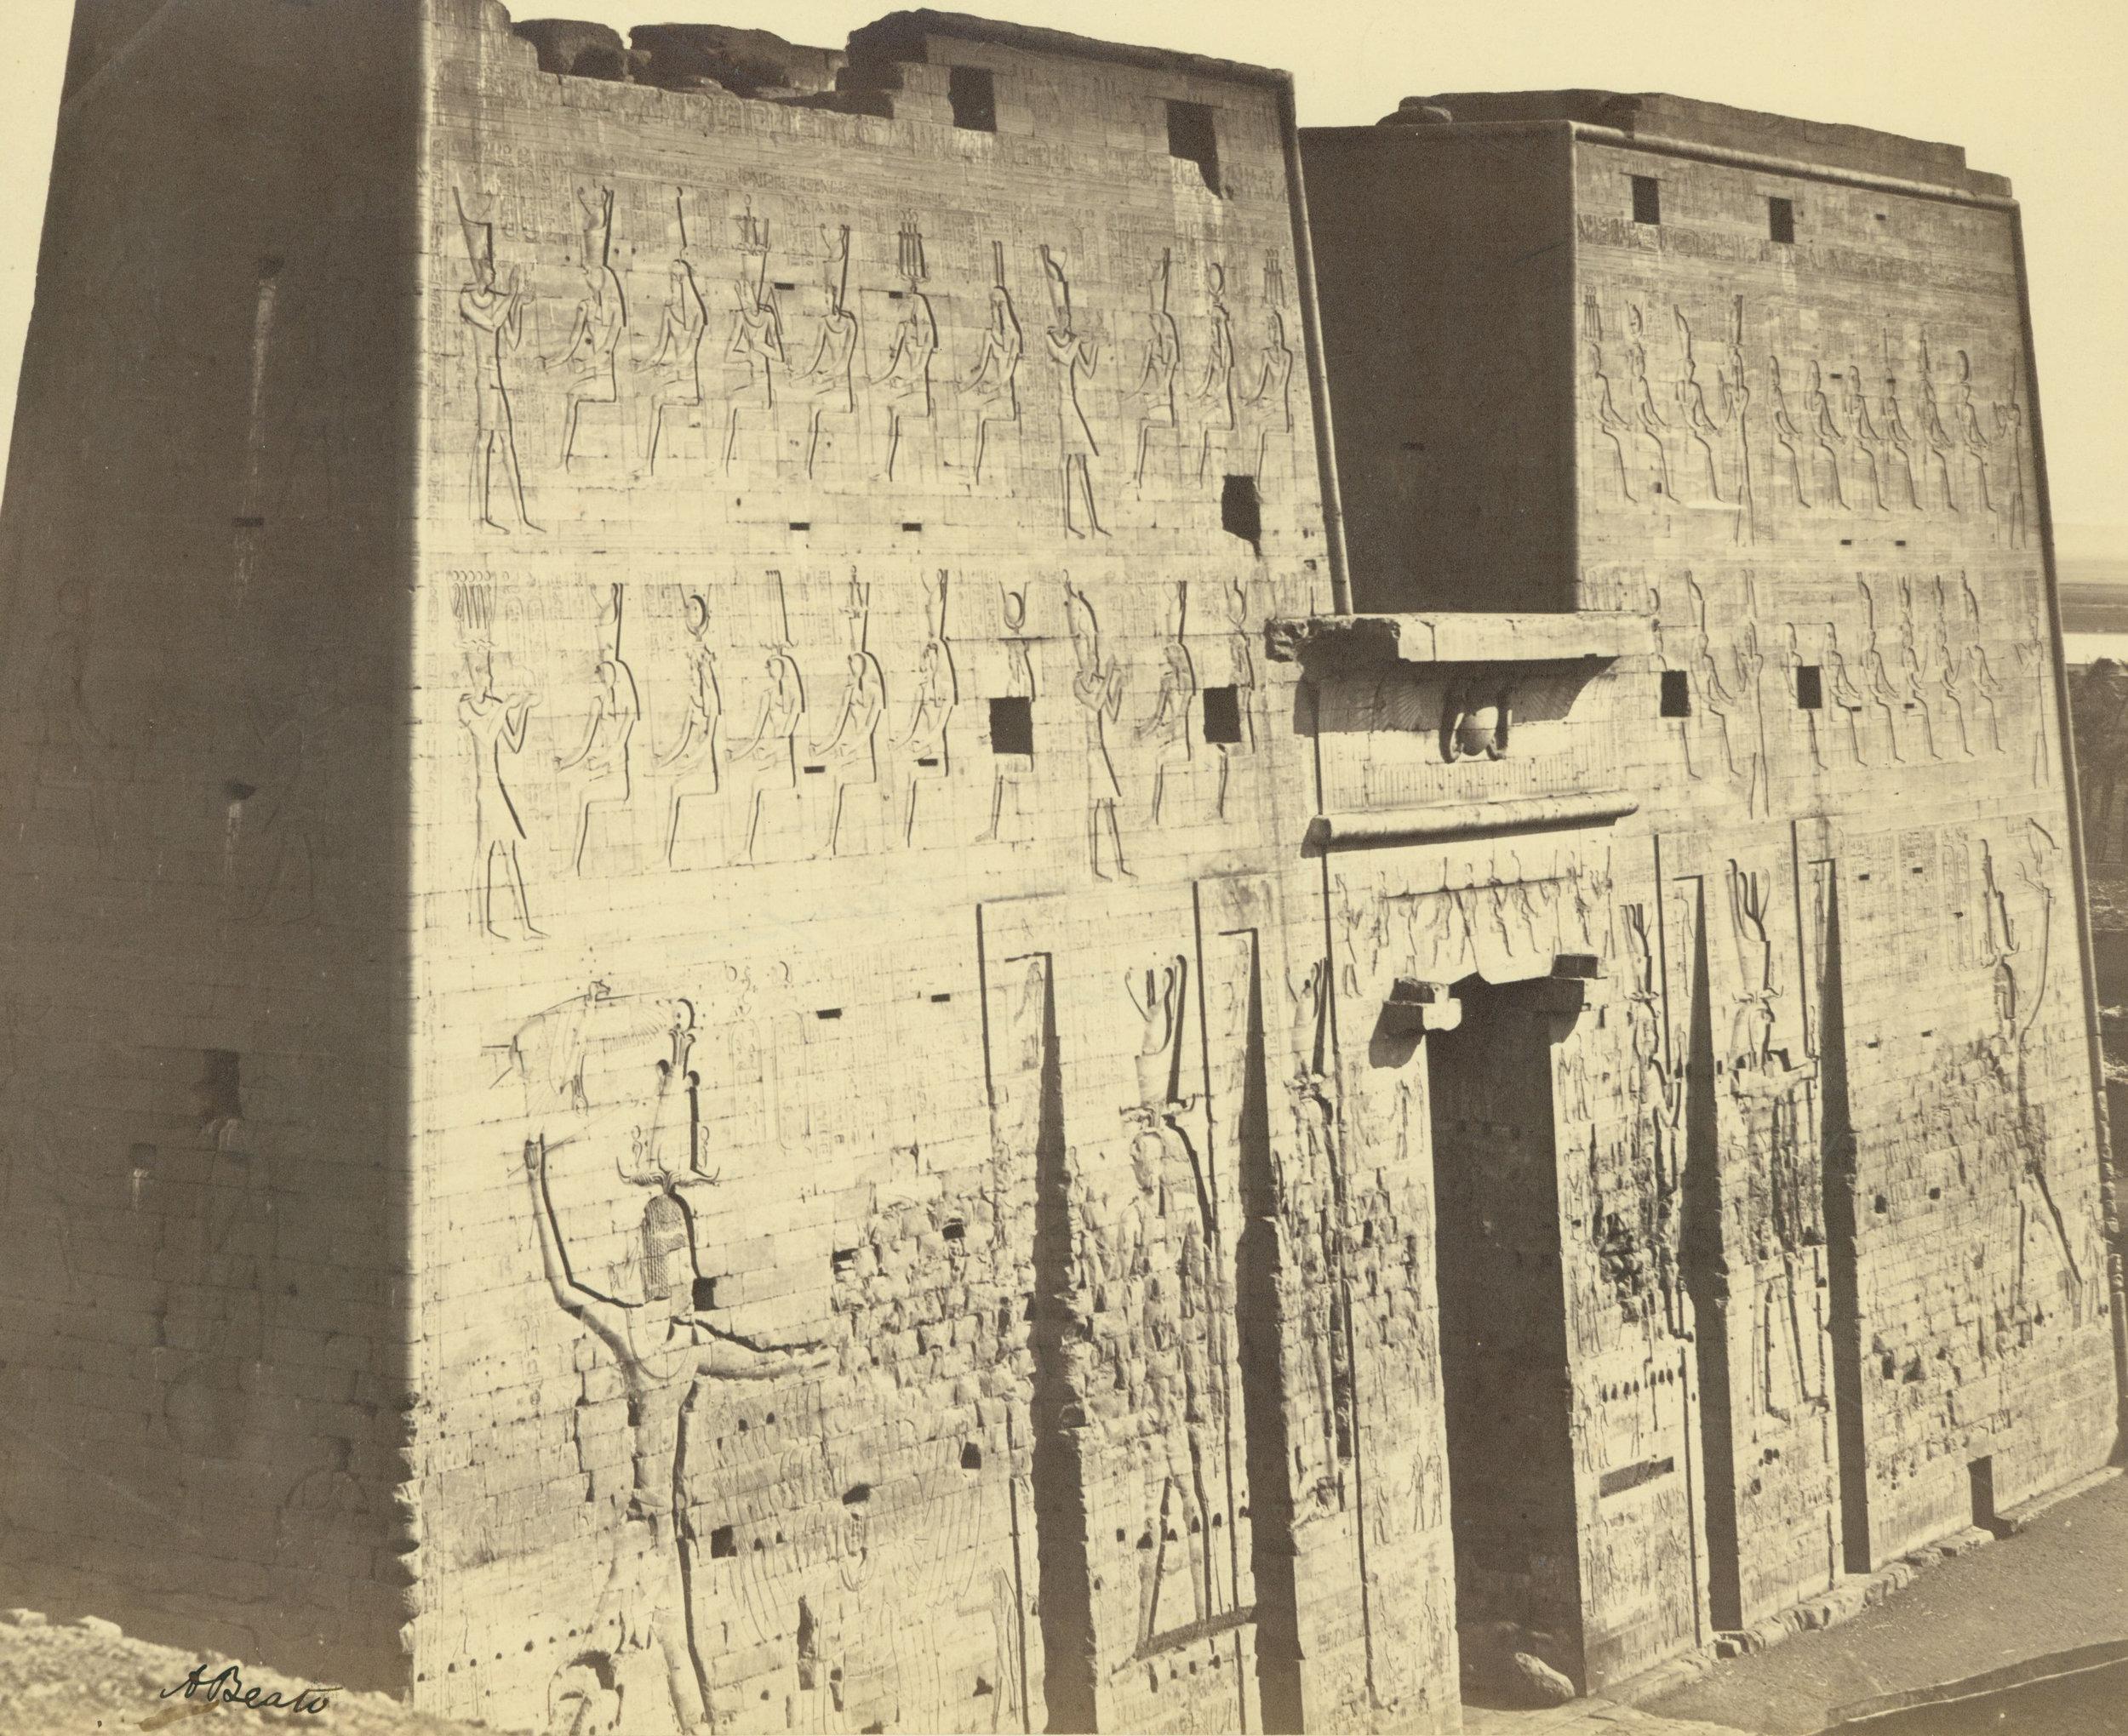 ANTONIO BEATO,  Pylon of the Temple of Horus at Edfu,   Egypt  c. 1887